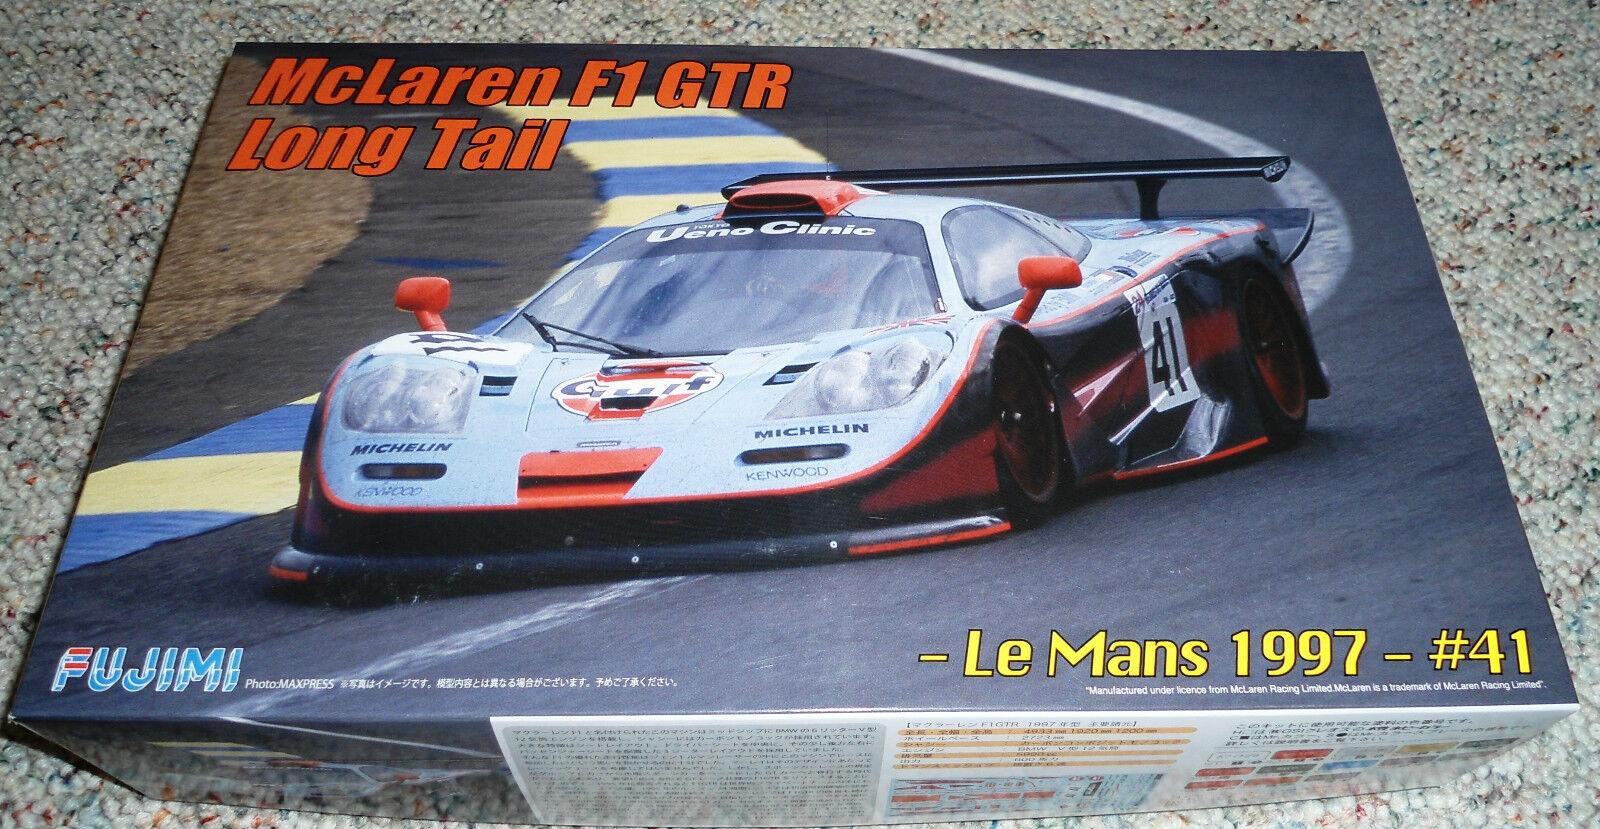 Fujimi 1 24 McLaren F1 GTR Longtail LeMans 1997 ()